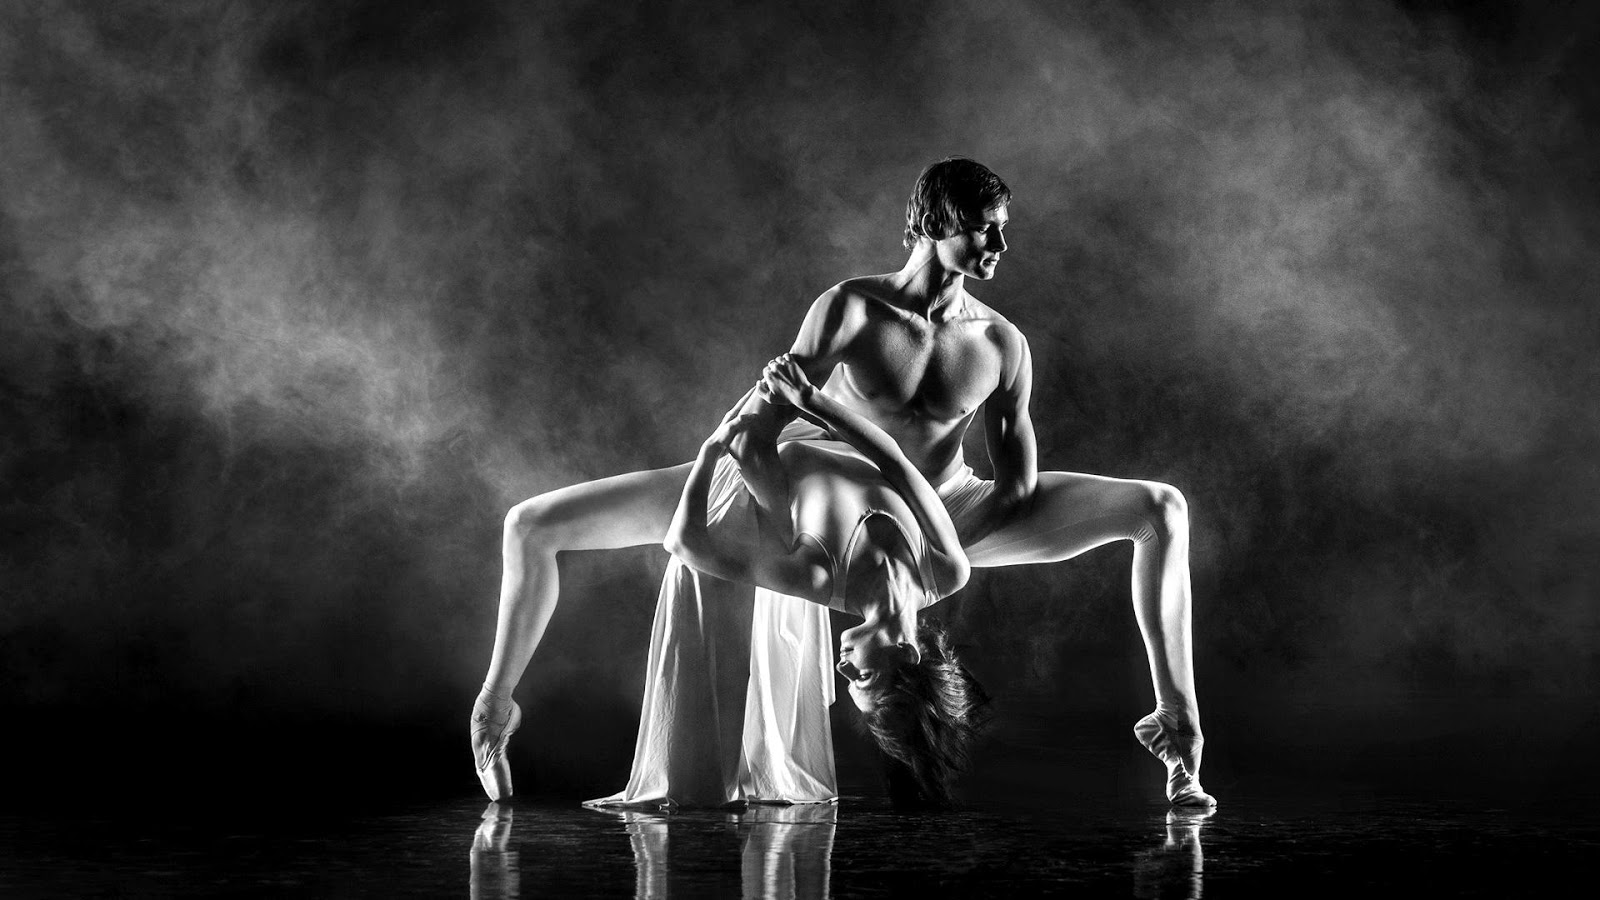 Ballet Dance Wallpapers Hd Resolution Dodskypict: Ballet Dance Cool Desktop Wallpapers